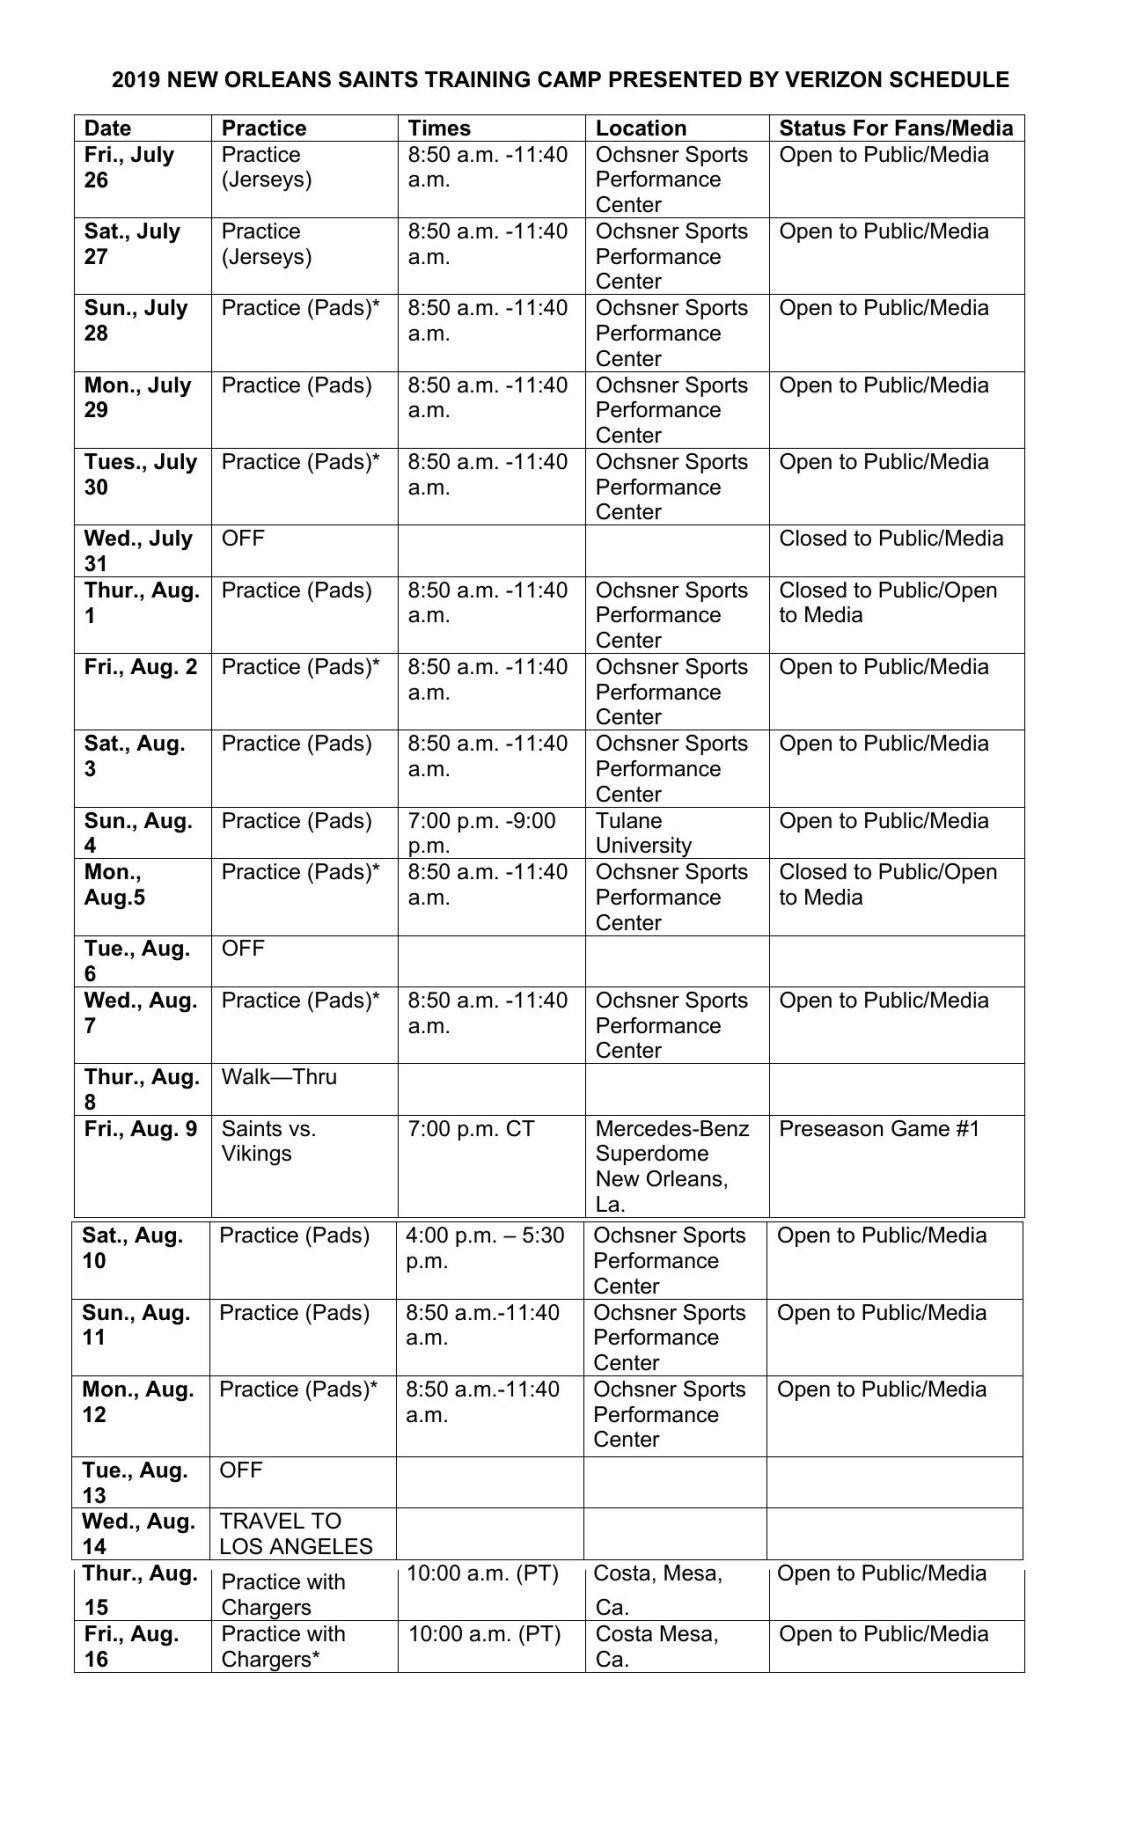 Saints training camp schedule 2019